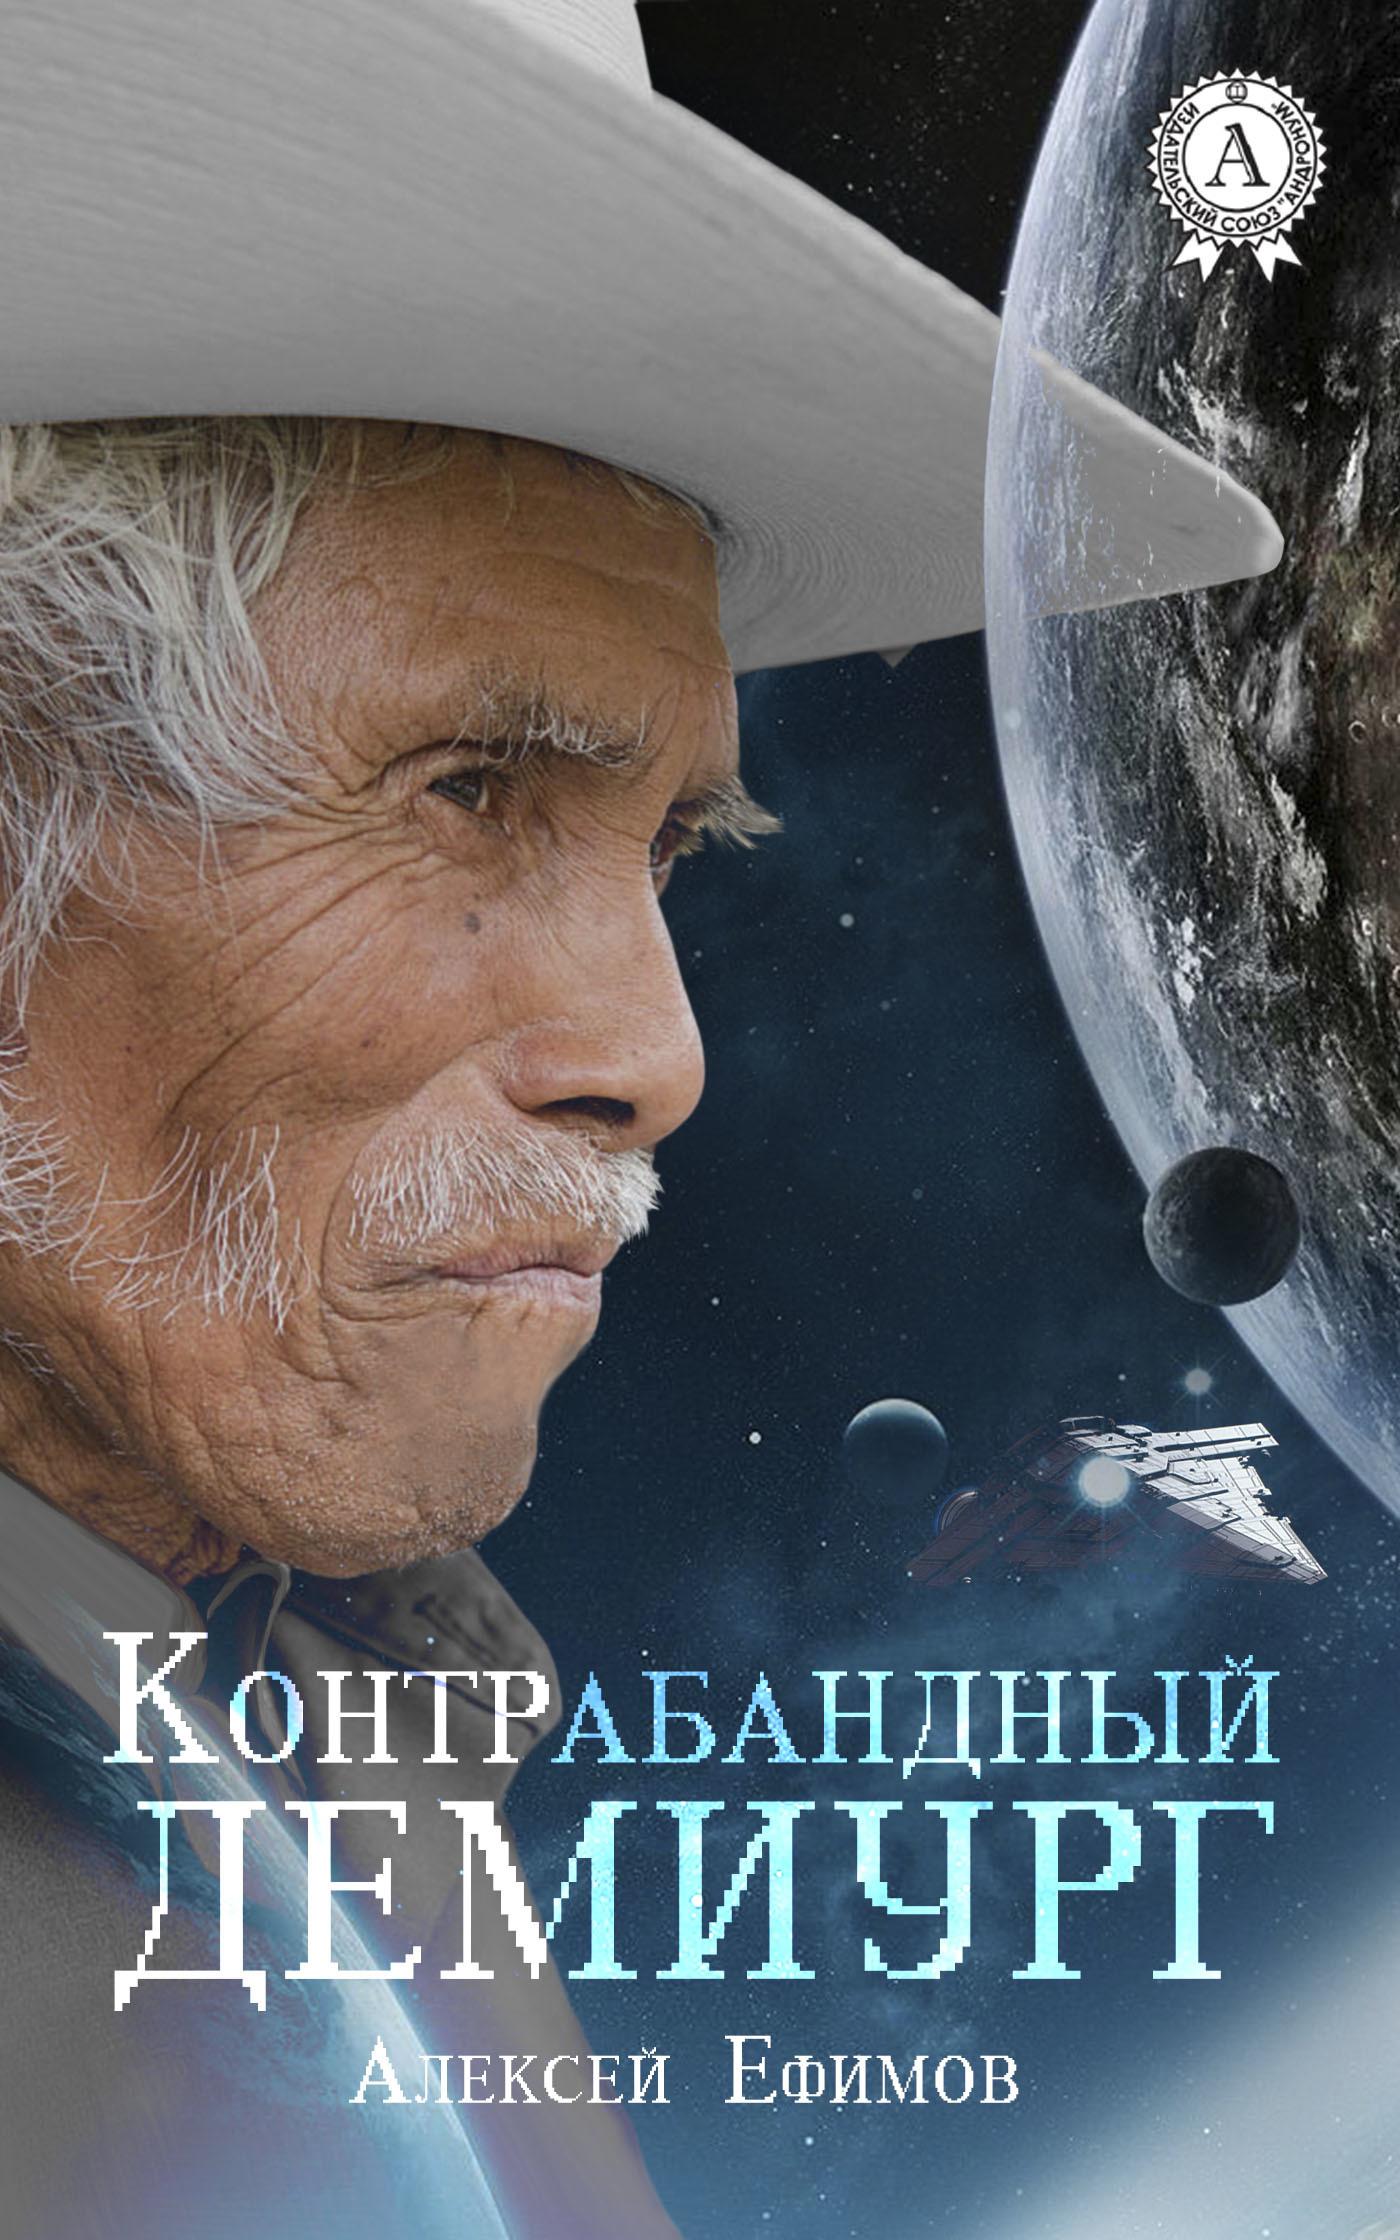 Шикарная заставка для романа 26/54/40/26544011.bin.dir/26544011.cover.jpg обложка